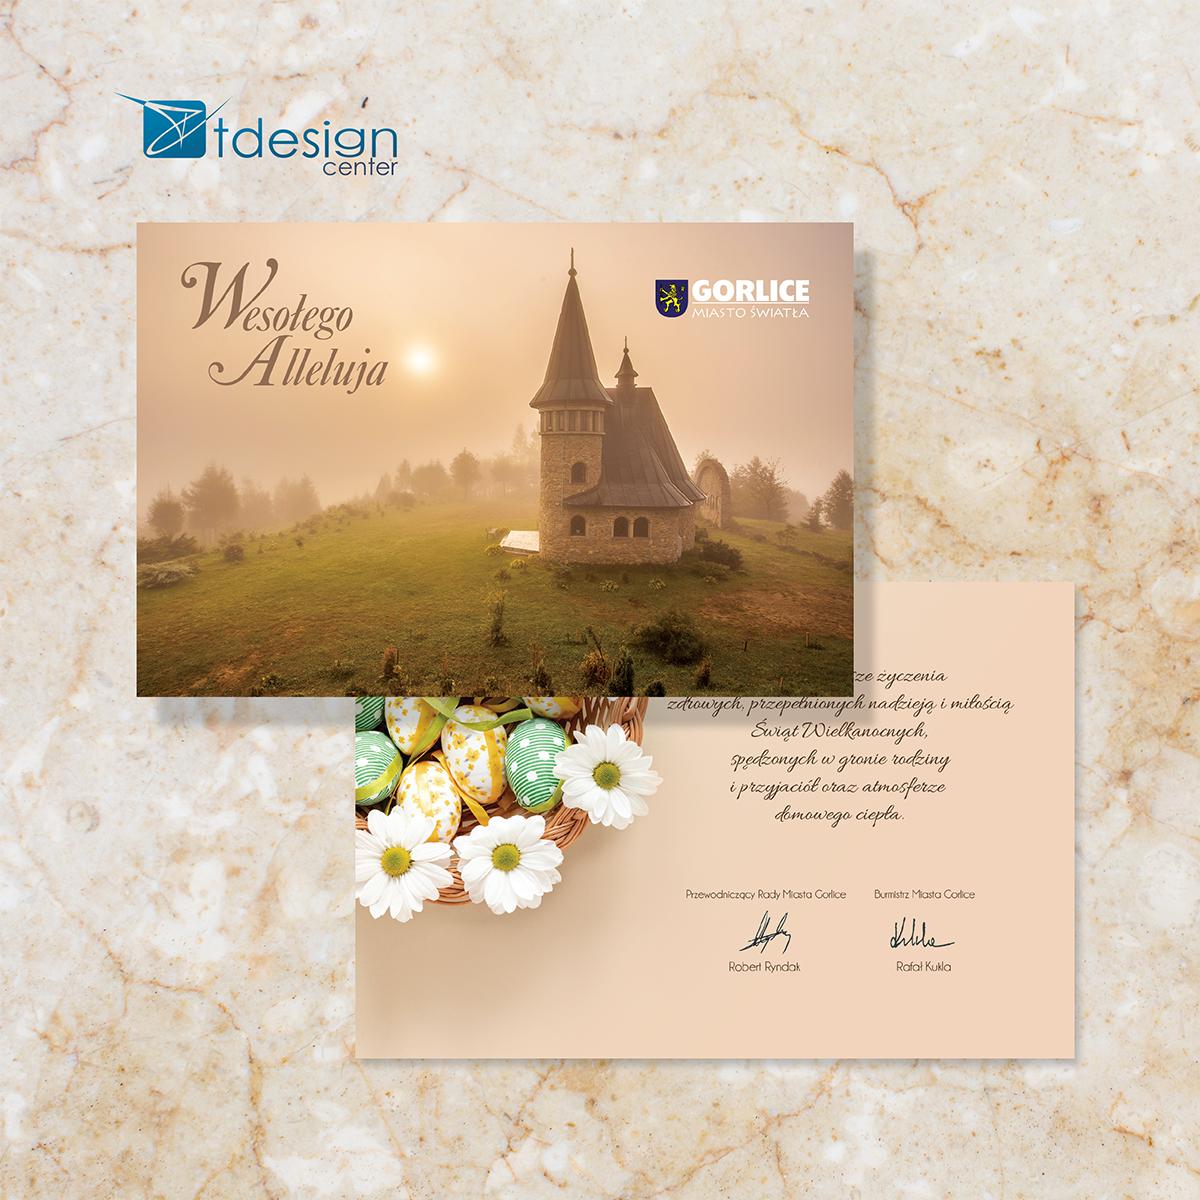 Kartka/pocztówka 150x98m - projekt + druk